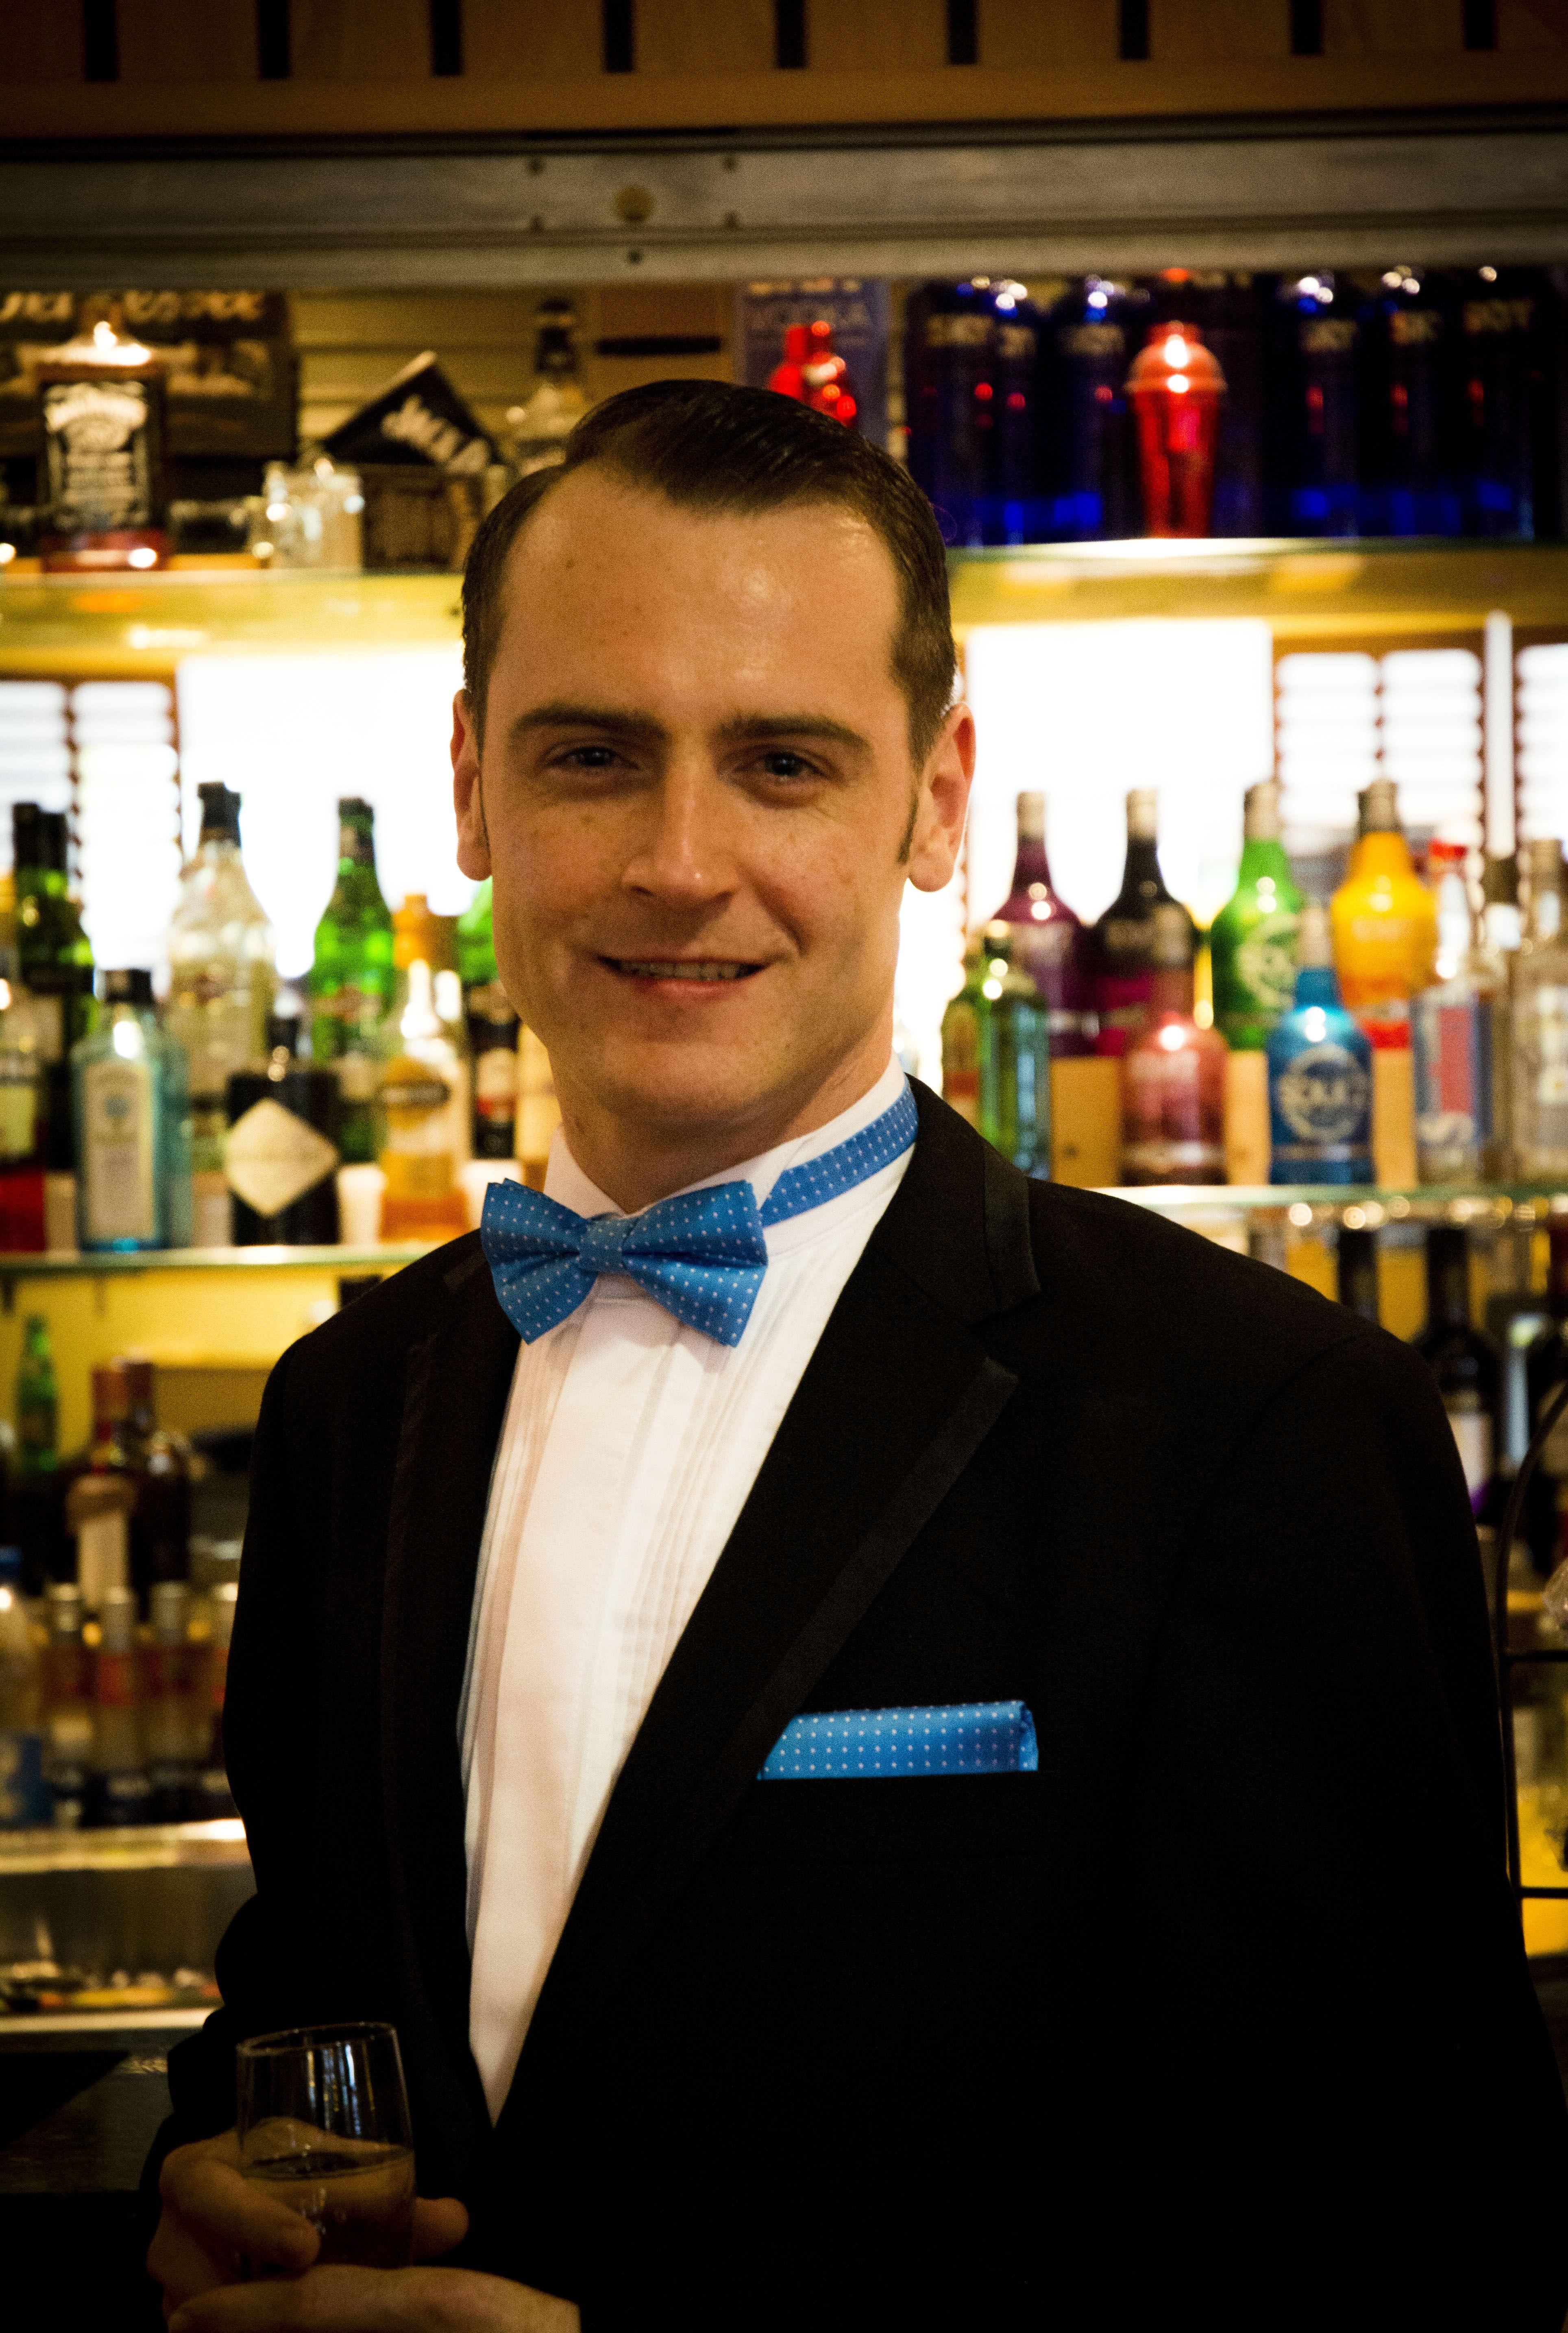 Emmett Mcerlane Runner Up For Receptionist Of The Year 2017 At Northern Ireland Hotel Federation